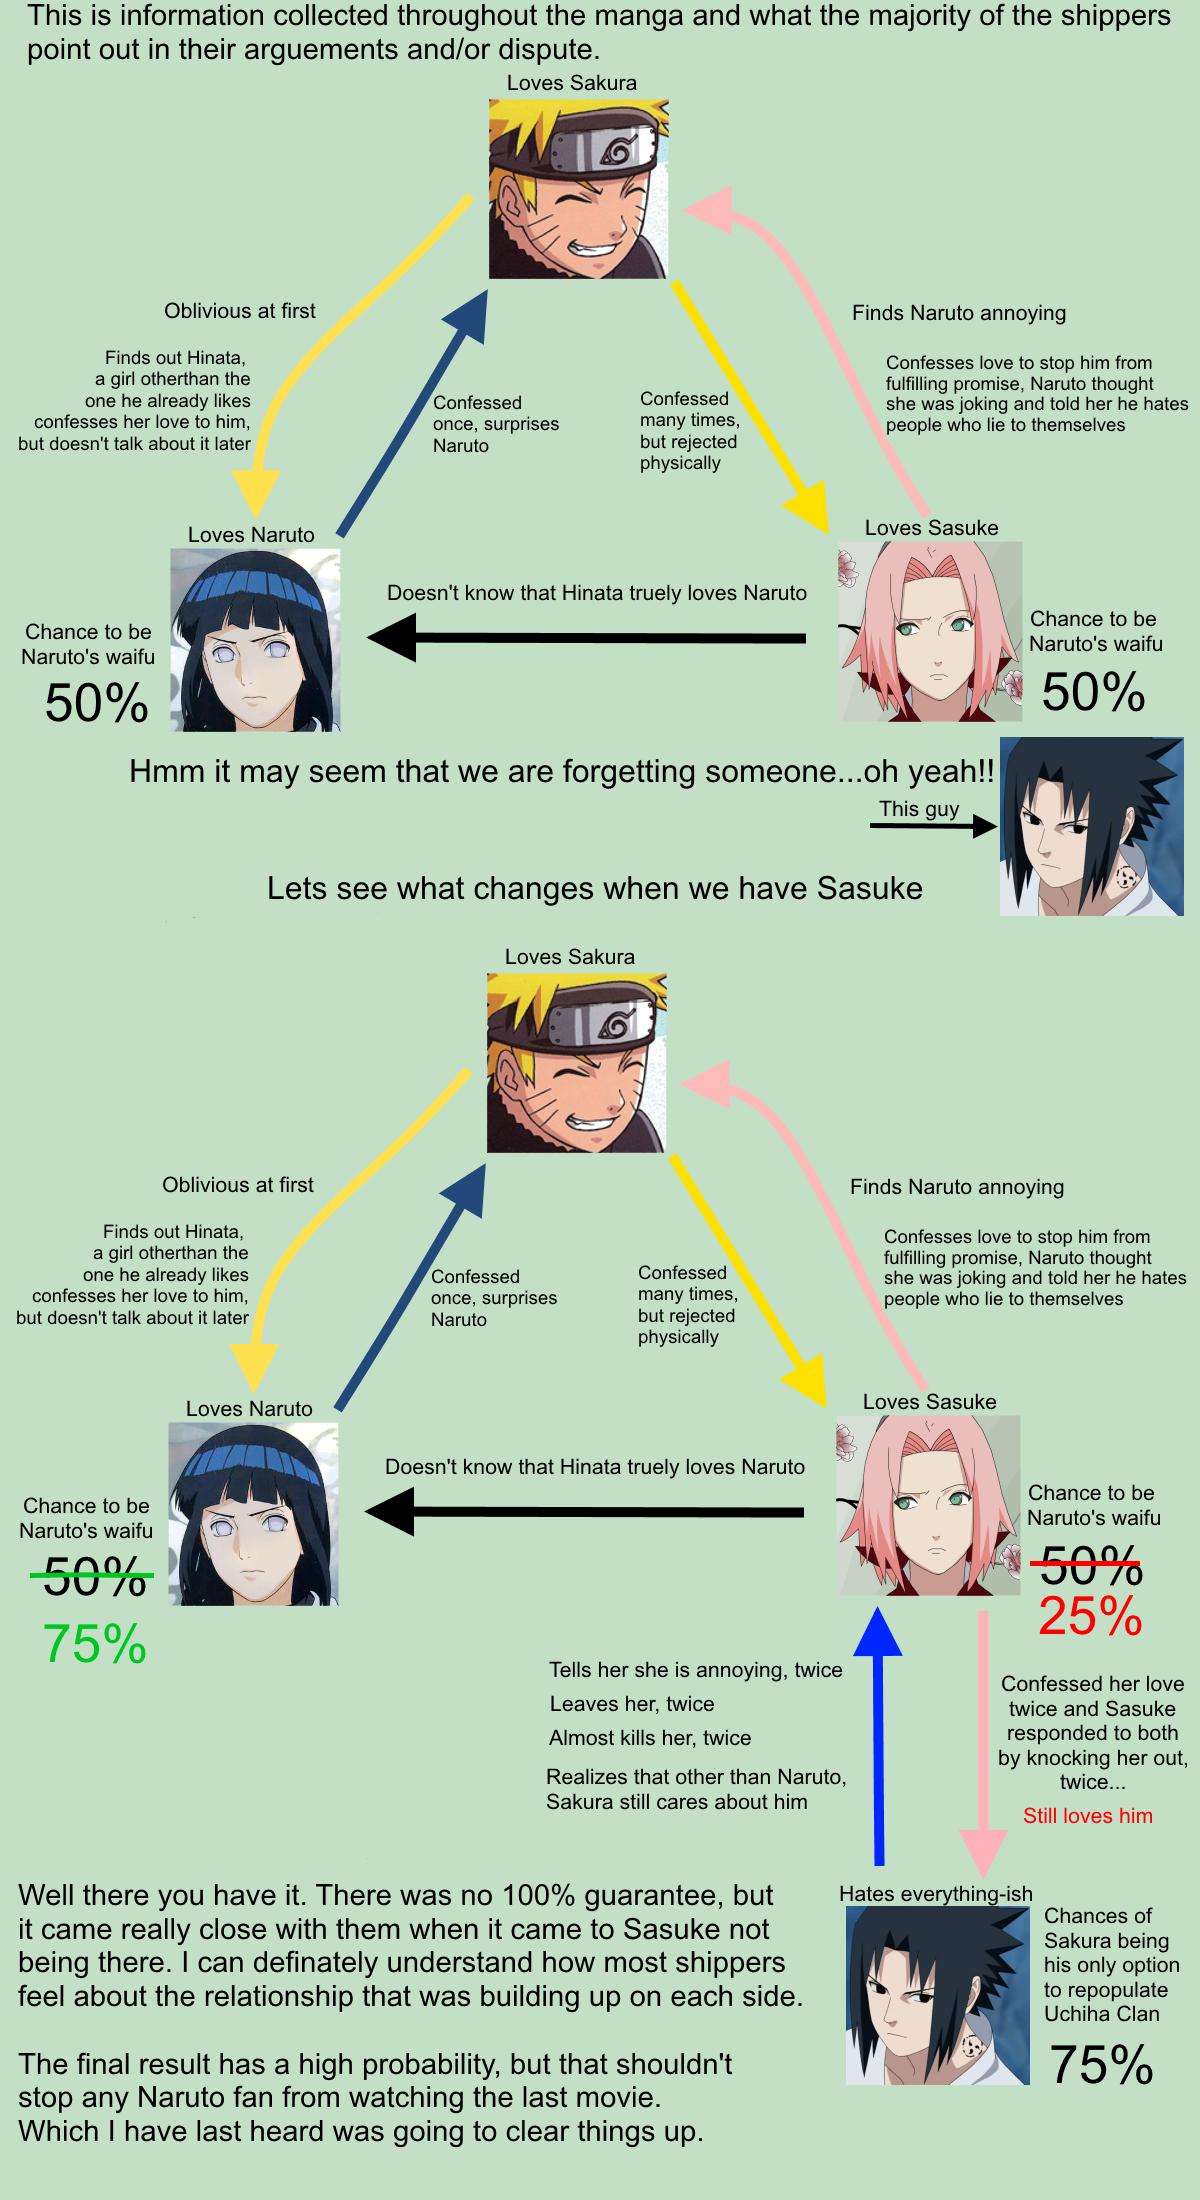 NaruHina vs NaruSaku results explained | Naruto | Know Your Meme